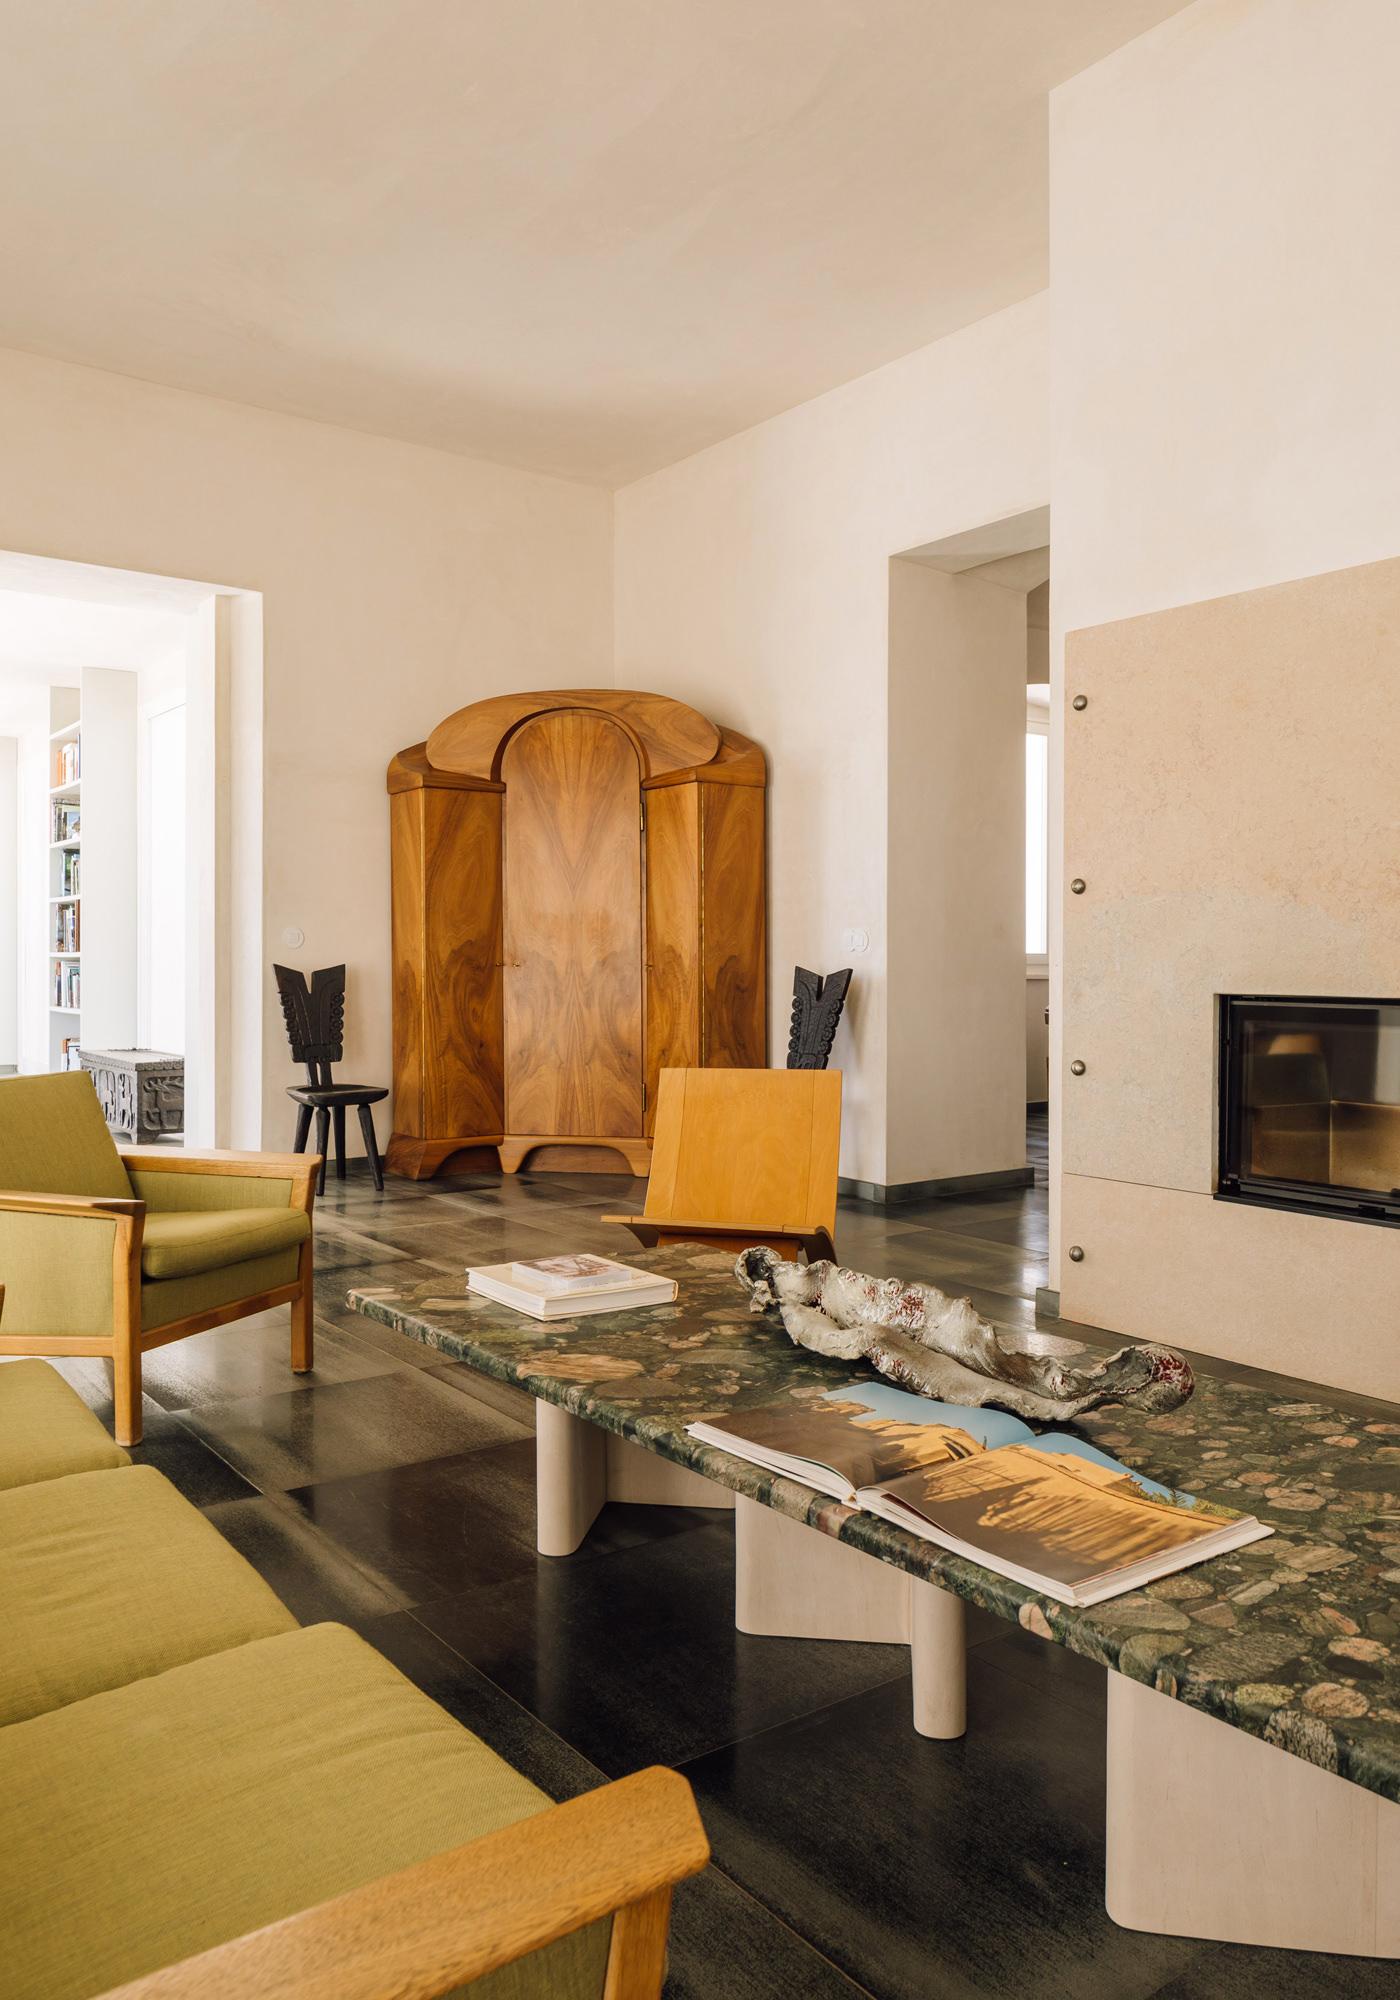 Da Licenca Hotel Alentejo Estremoz Portugal Mobiliers